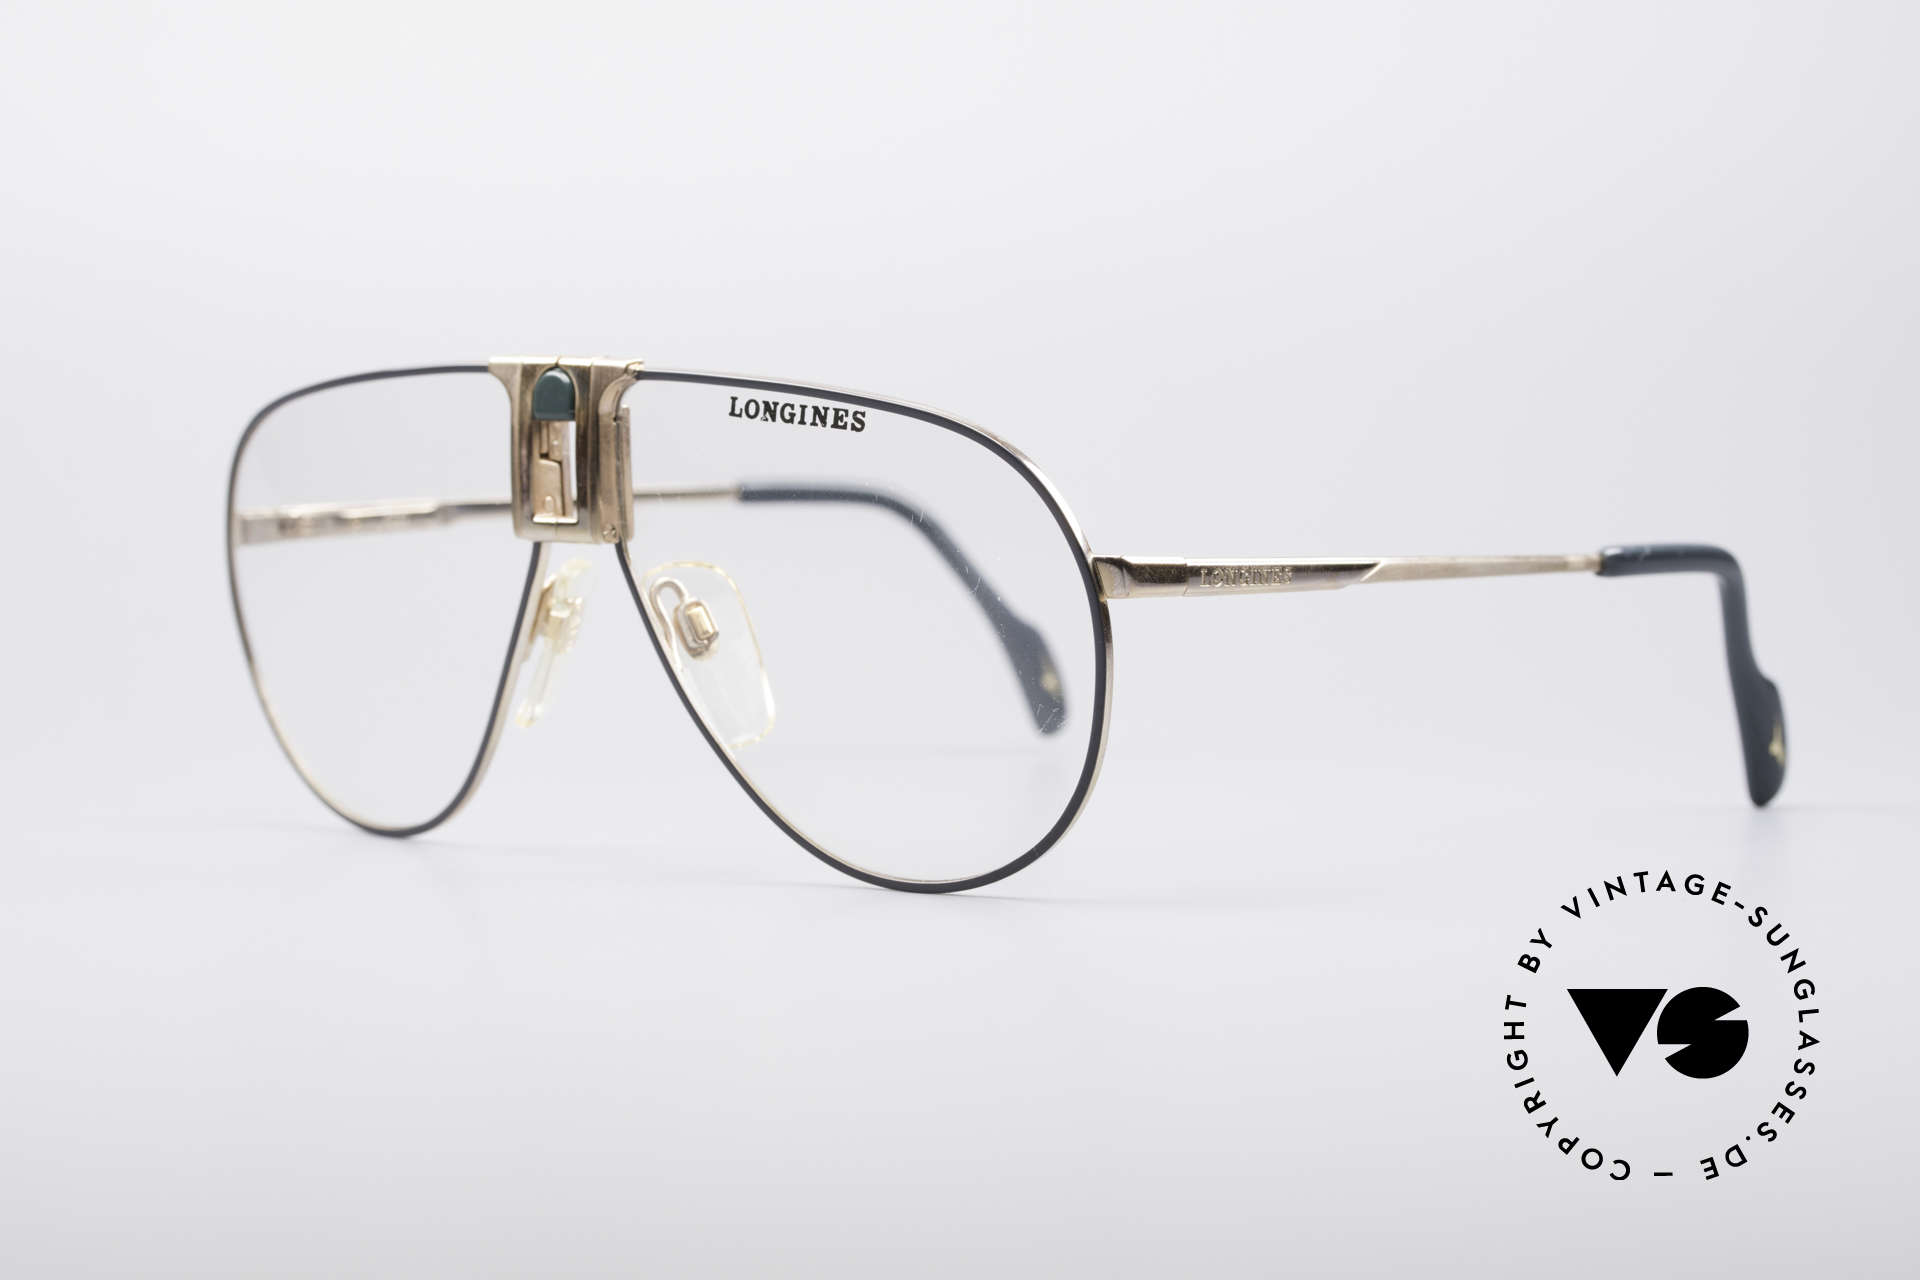 Longines 0154 1980's Aviator Glasses, classic aviator design & timeless coloring (gold/gray), Made for Men